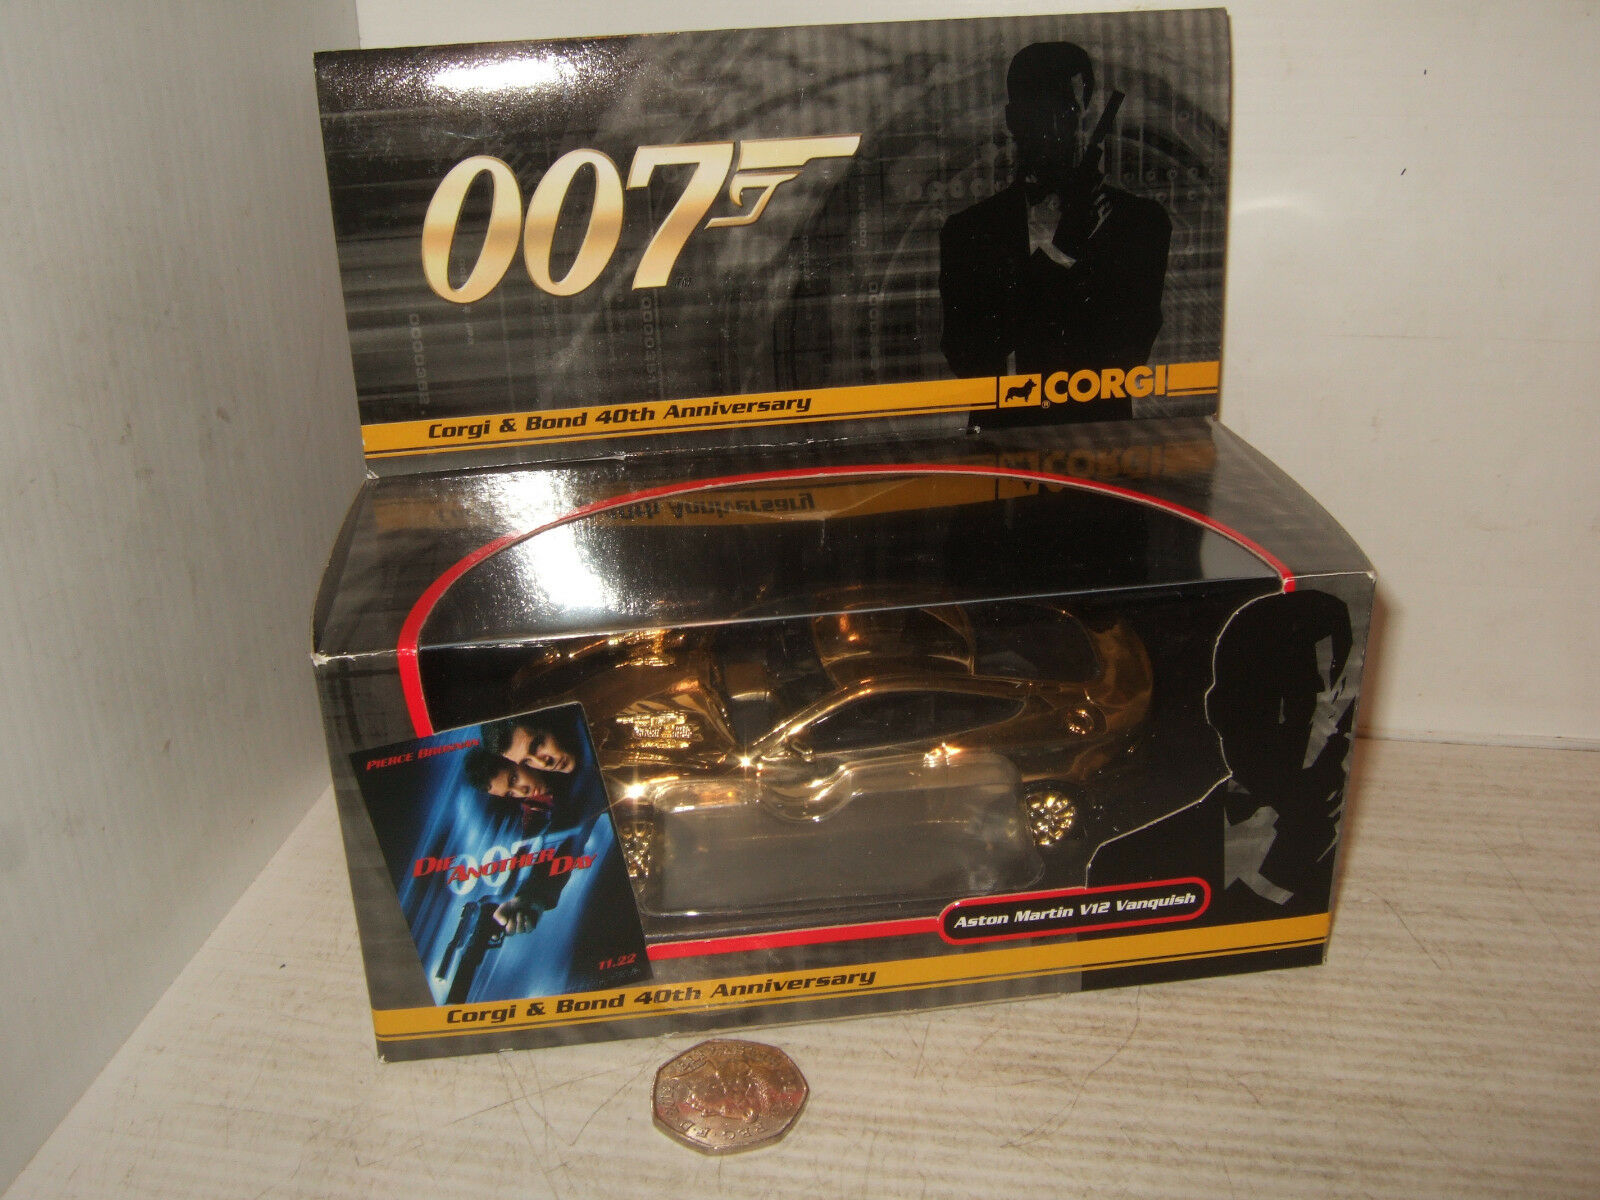 Corgi CC7505 40th Anniversary gold Plated Aston Martin V12 Vanquish 1 36 Scale